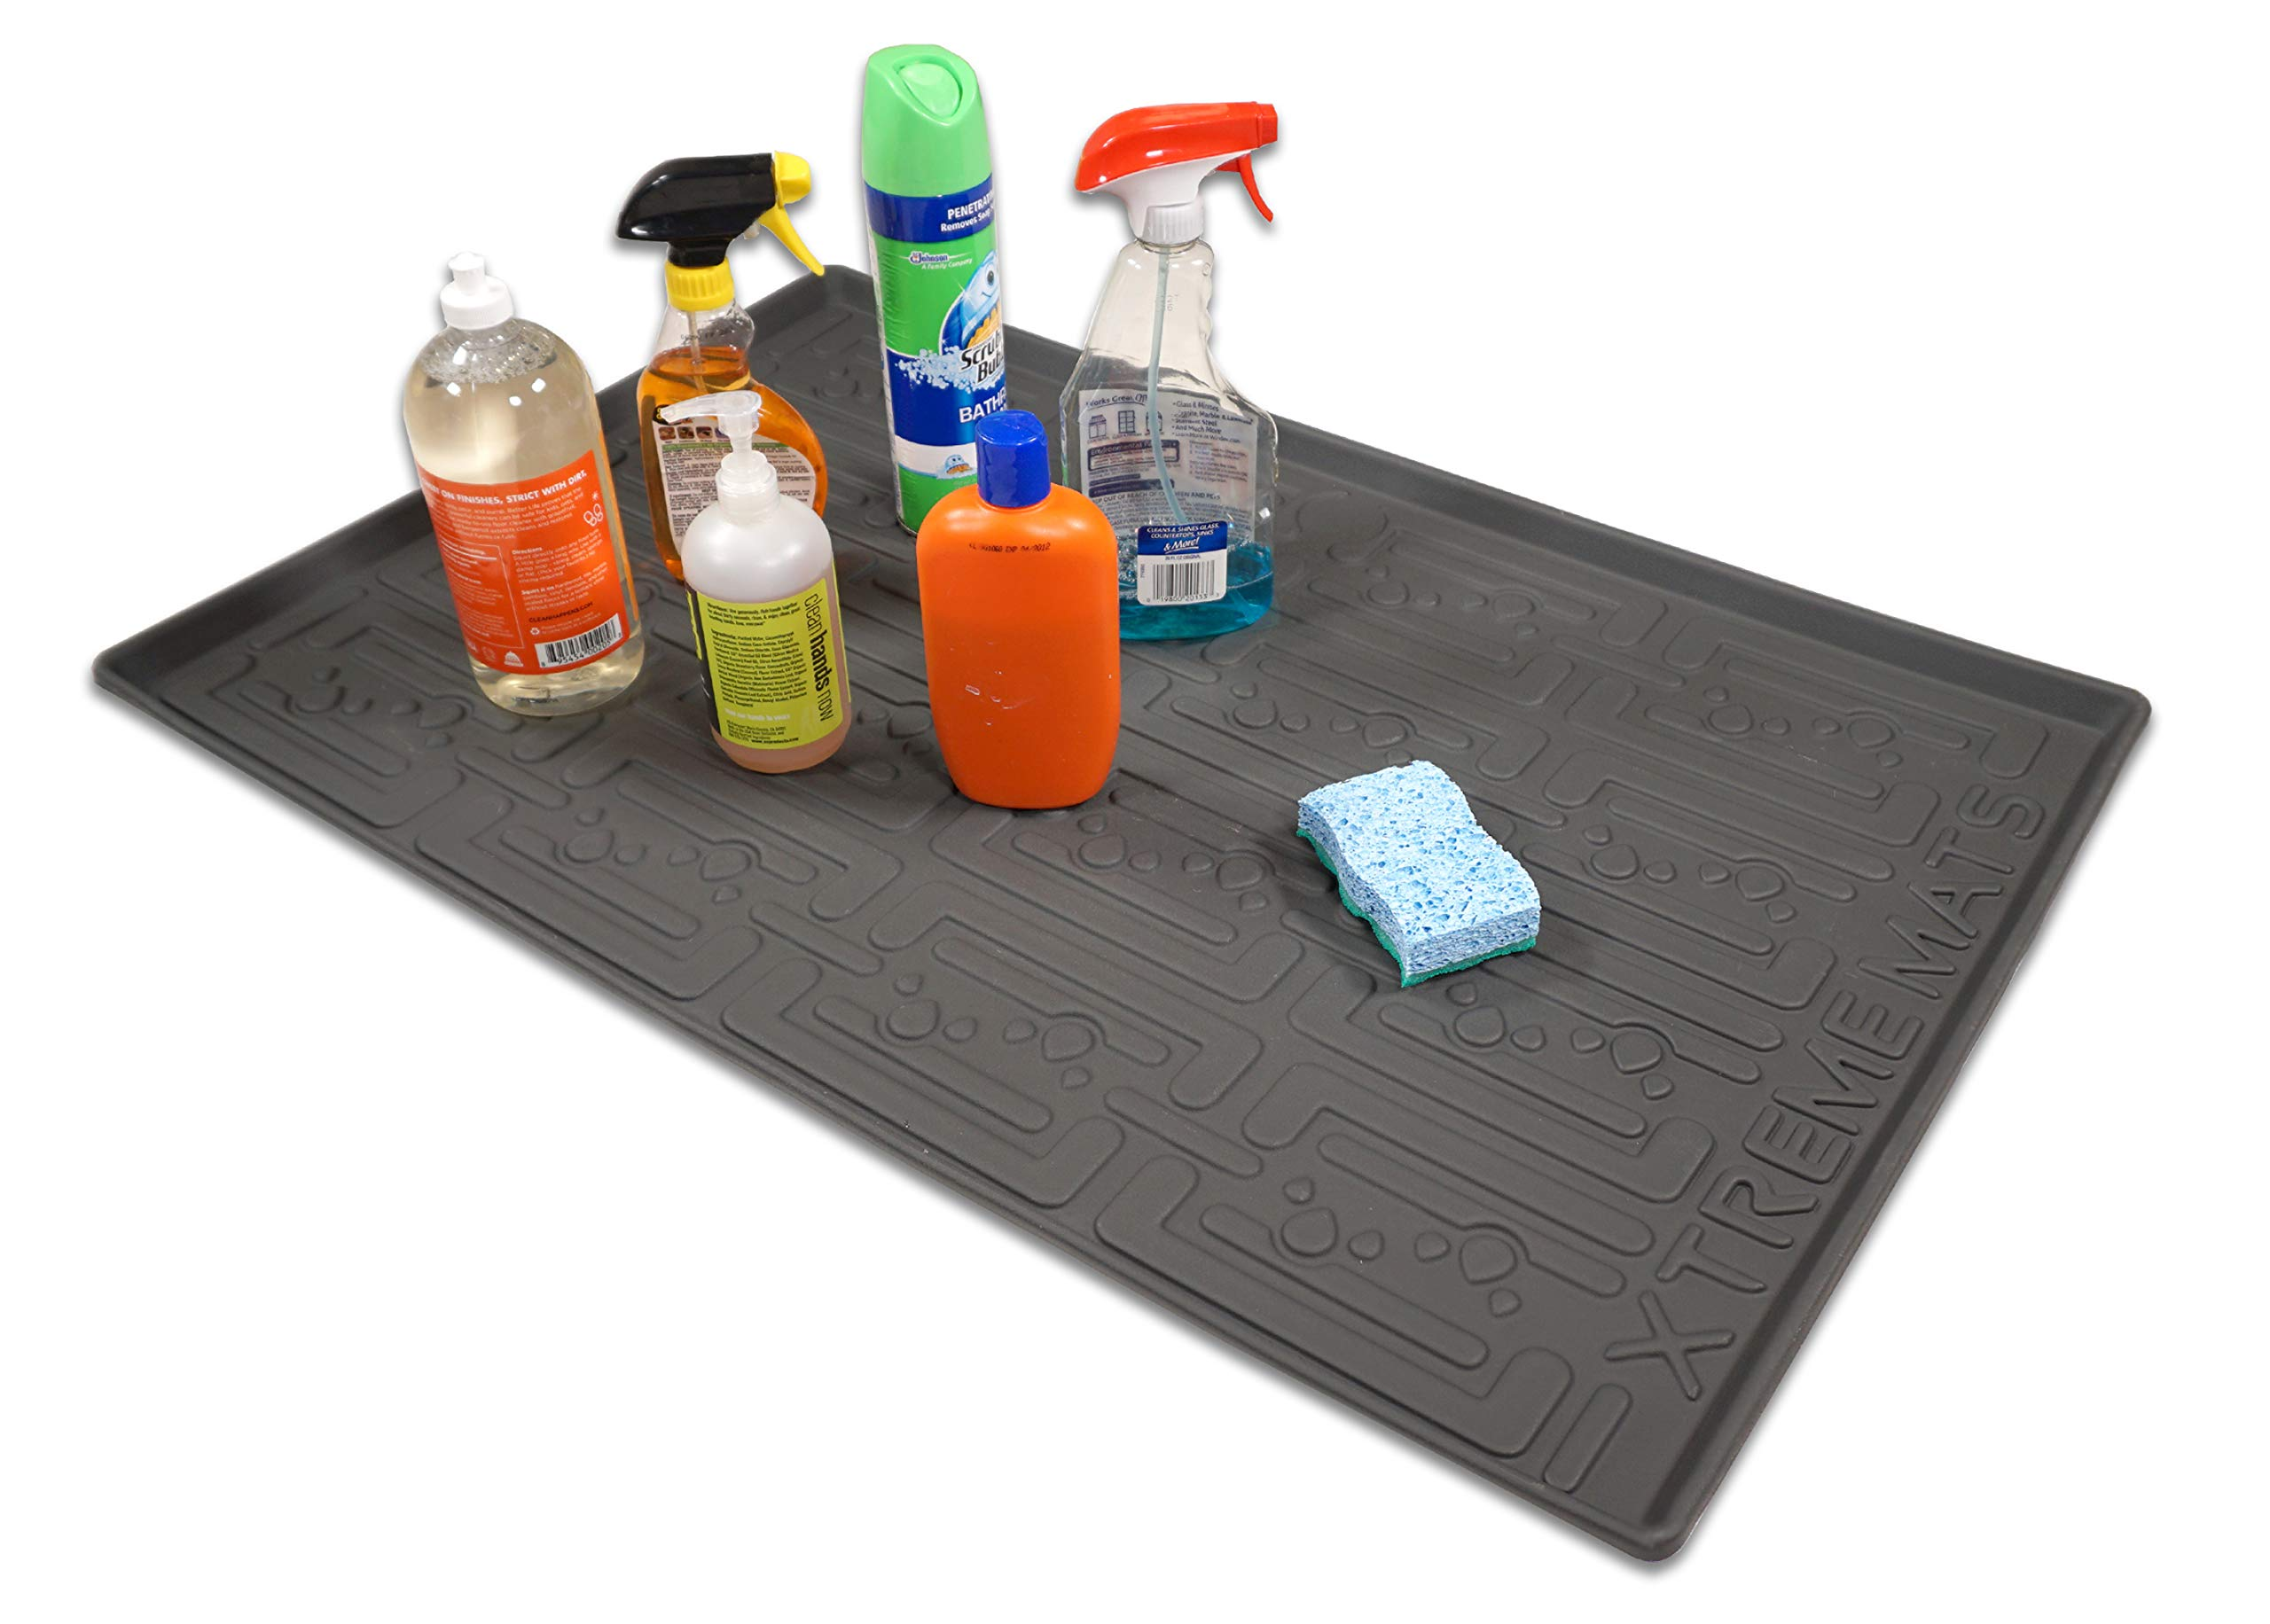 Xtreme Mats Under Sink Kitchen Cabinet Mat, 30 5/8 x 21 7/8, Grey by Xtreme Mats